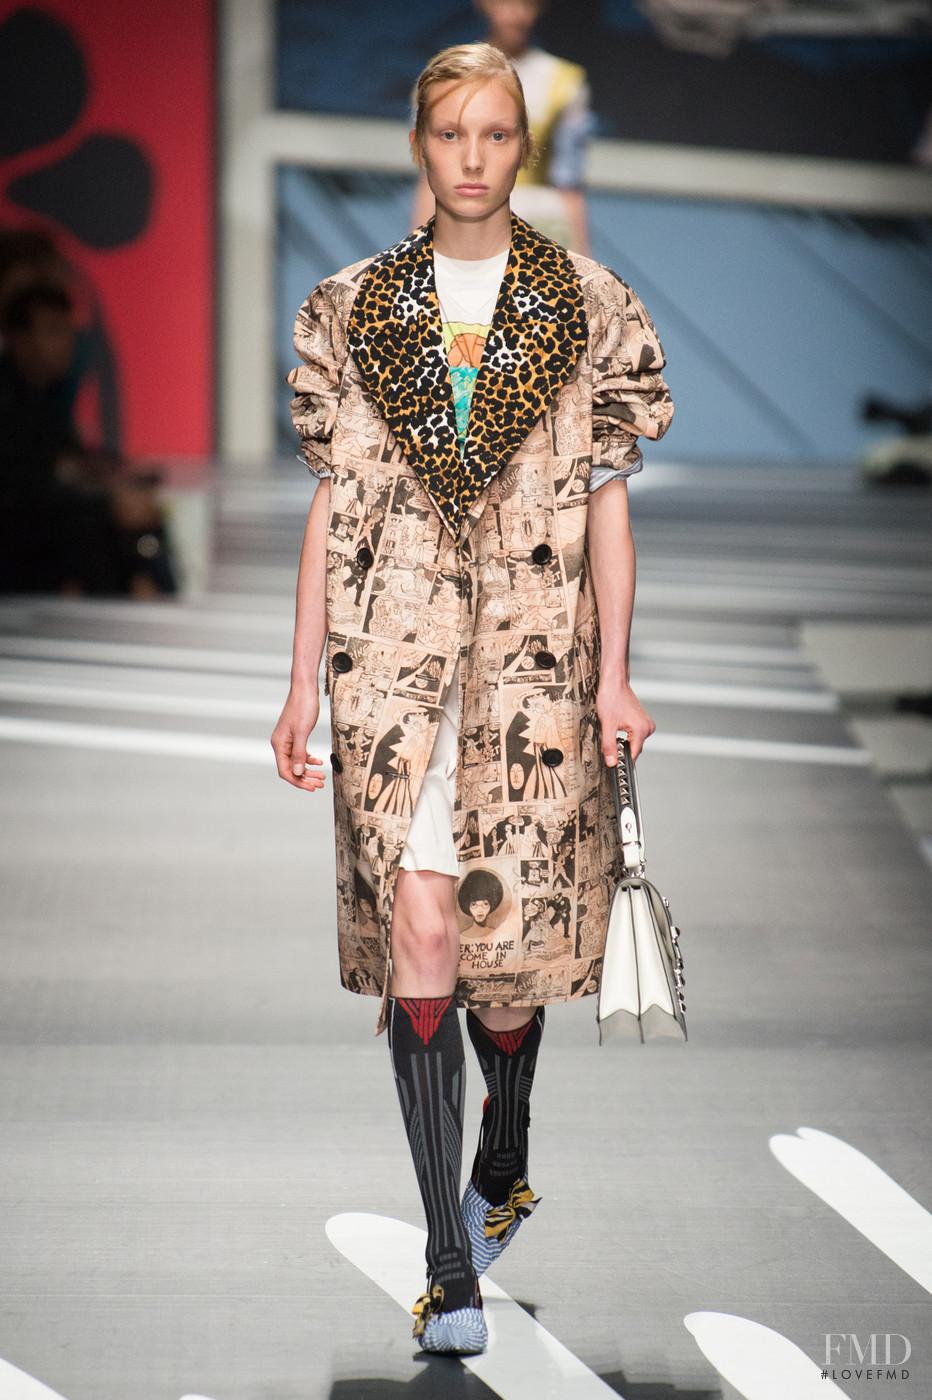 London Fashion Week - Home 68